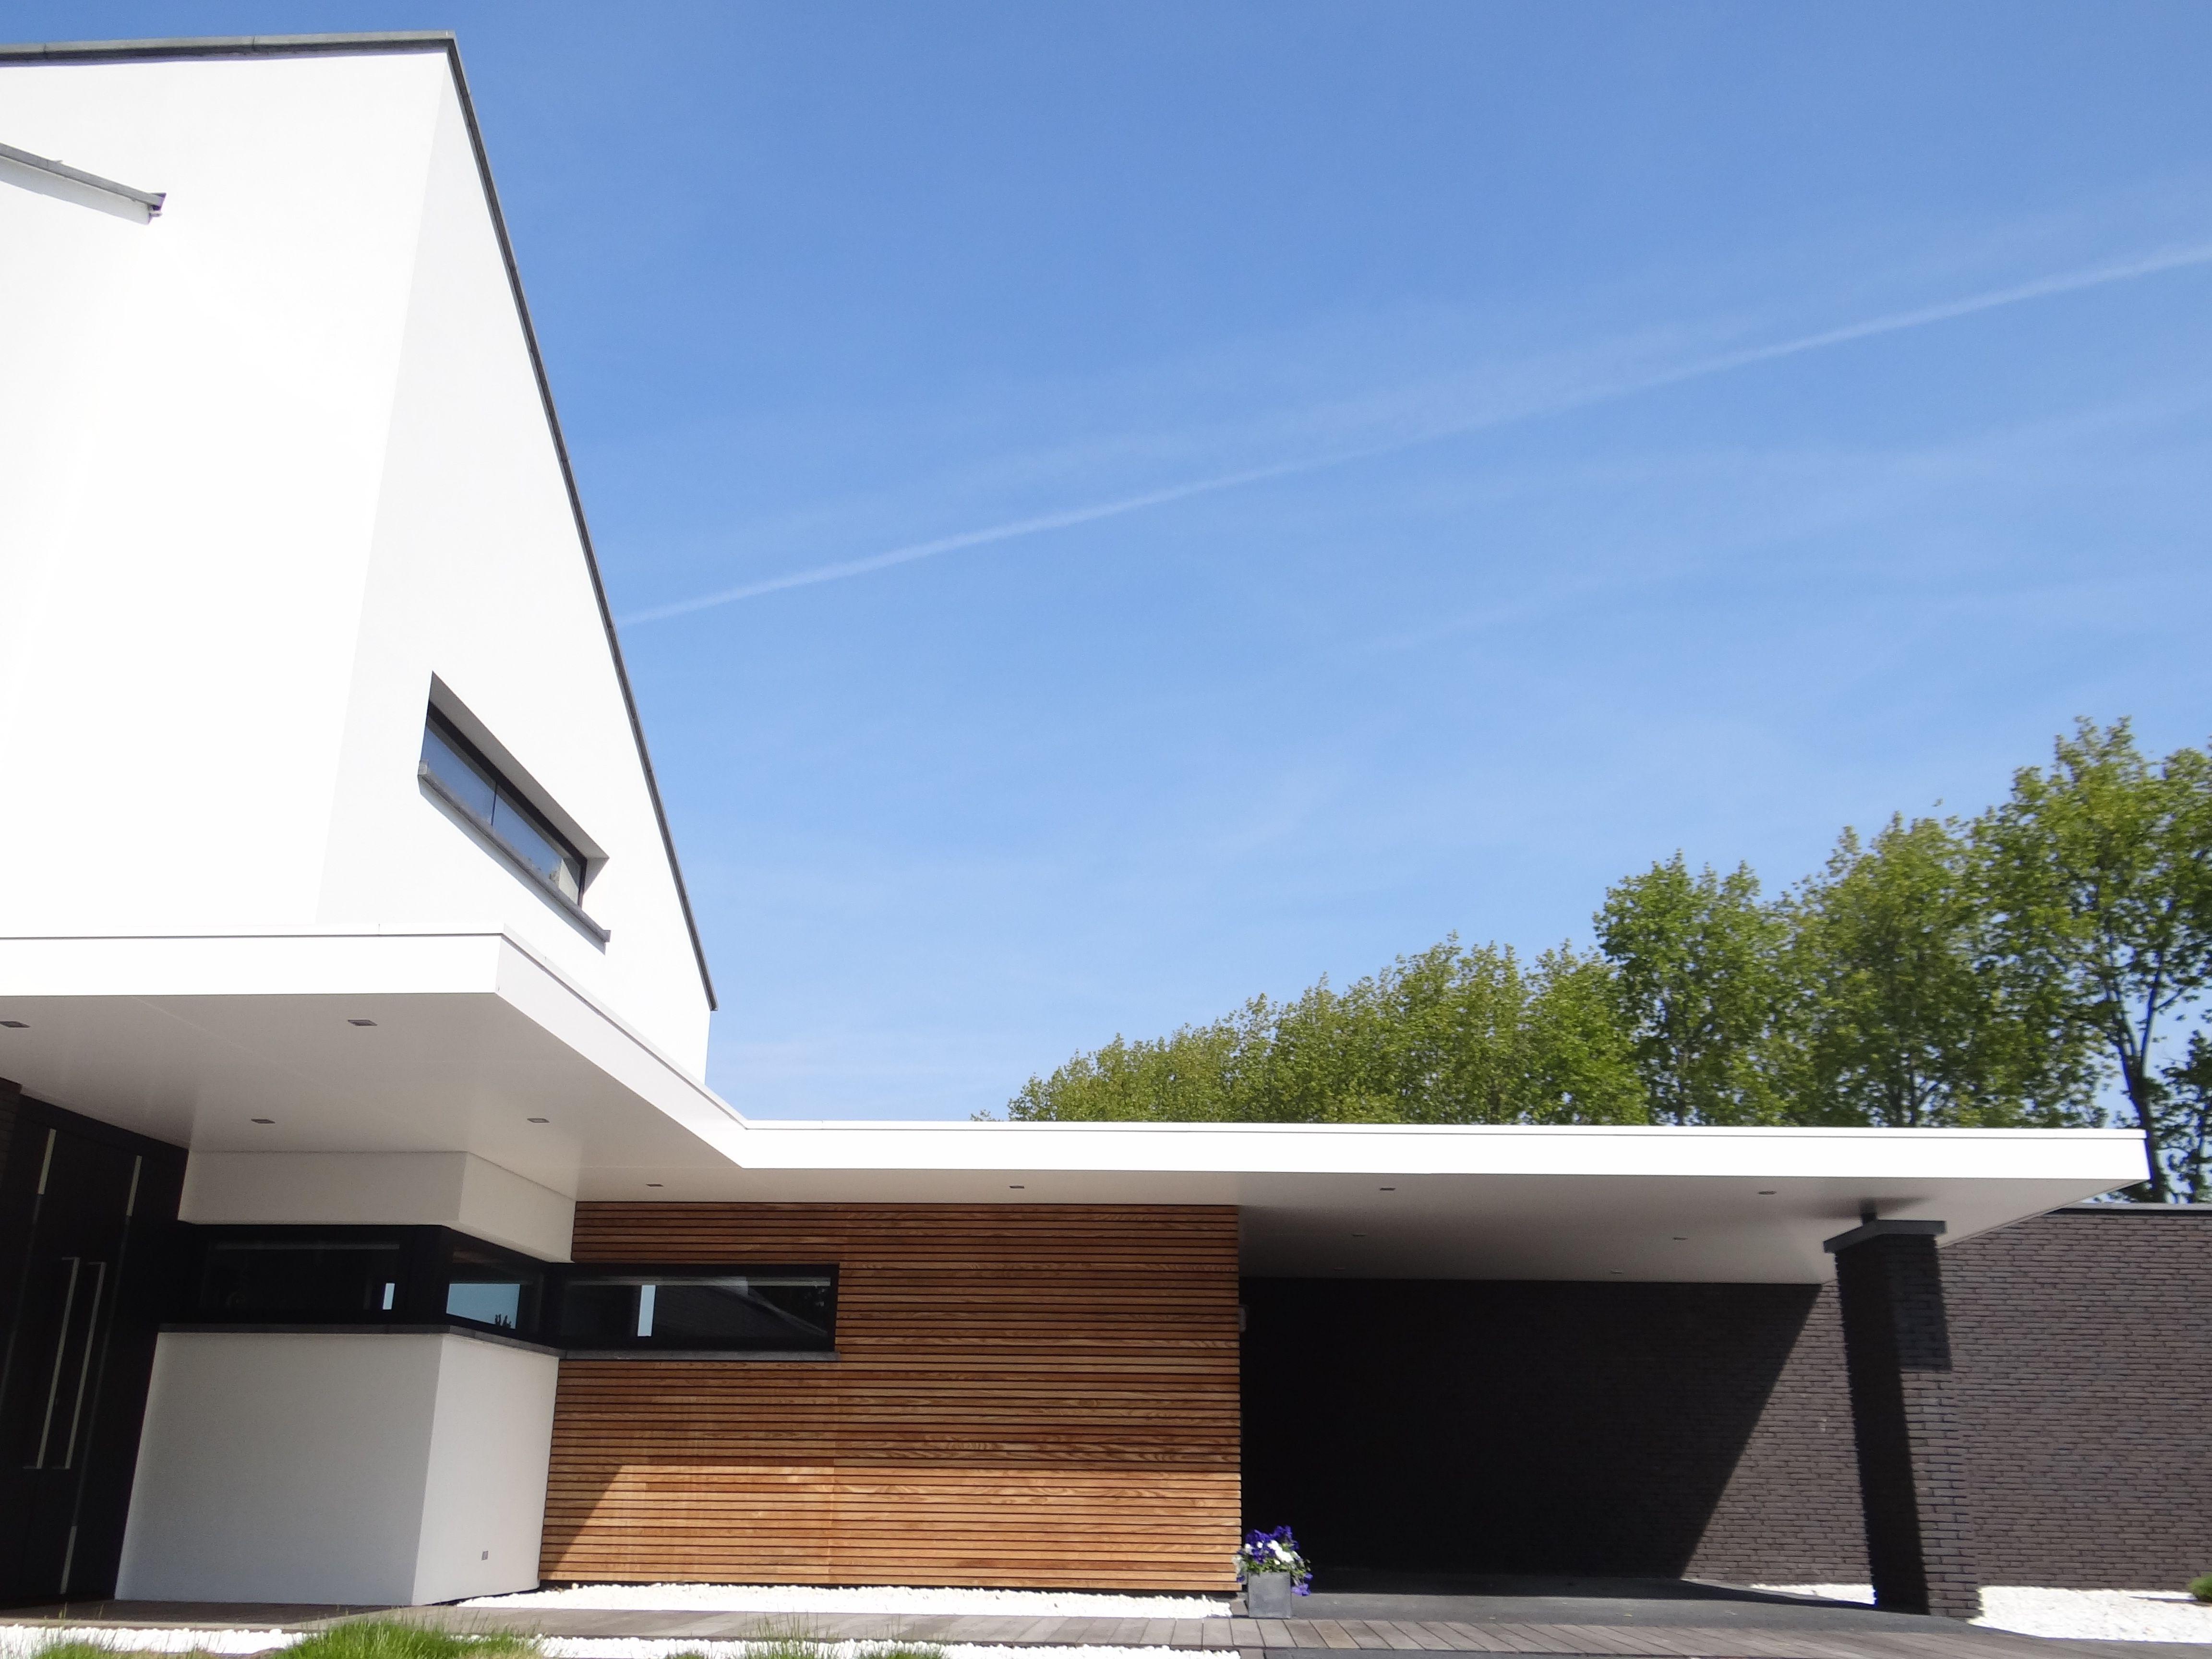 Sjaak goud architect villa waterlandkerkje nederland wit